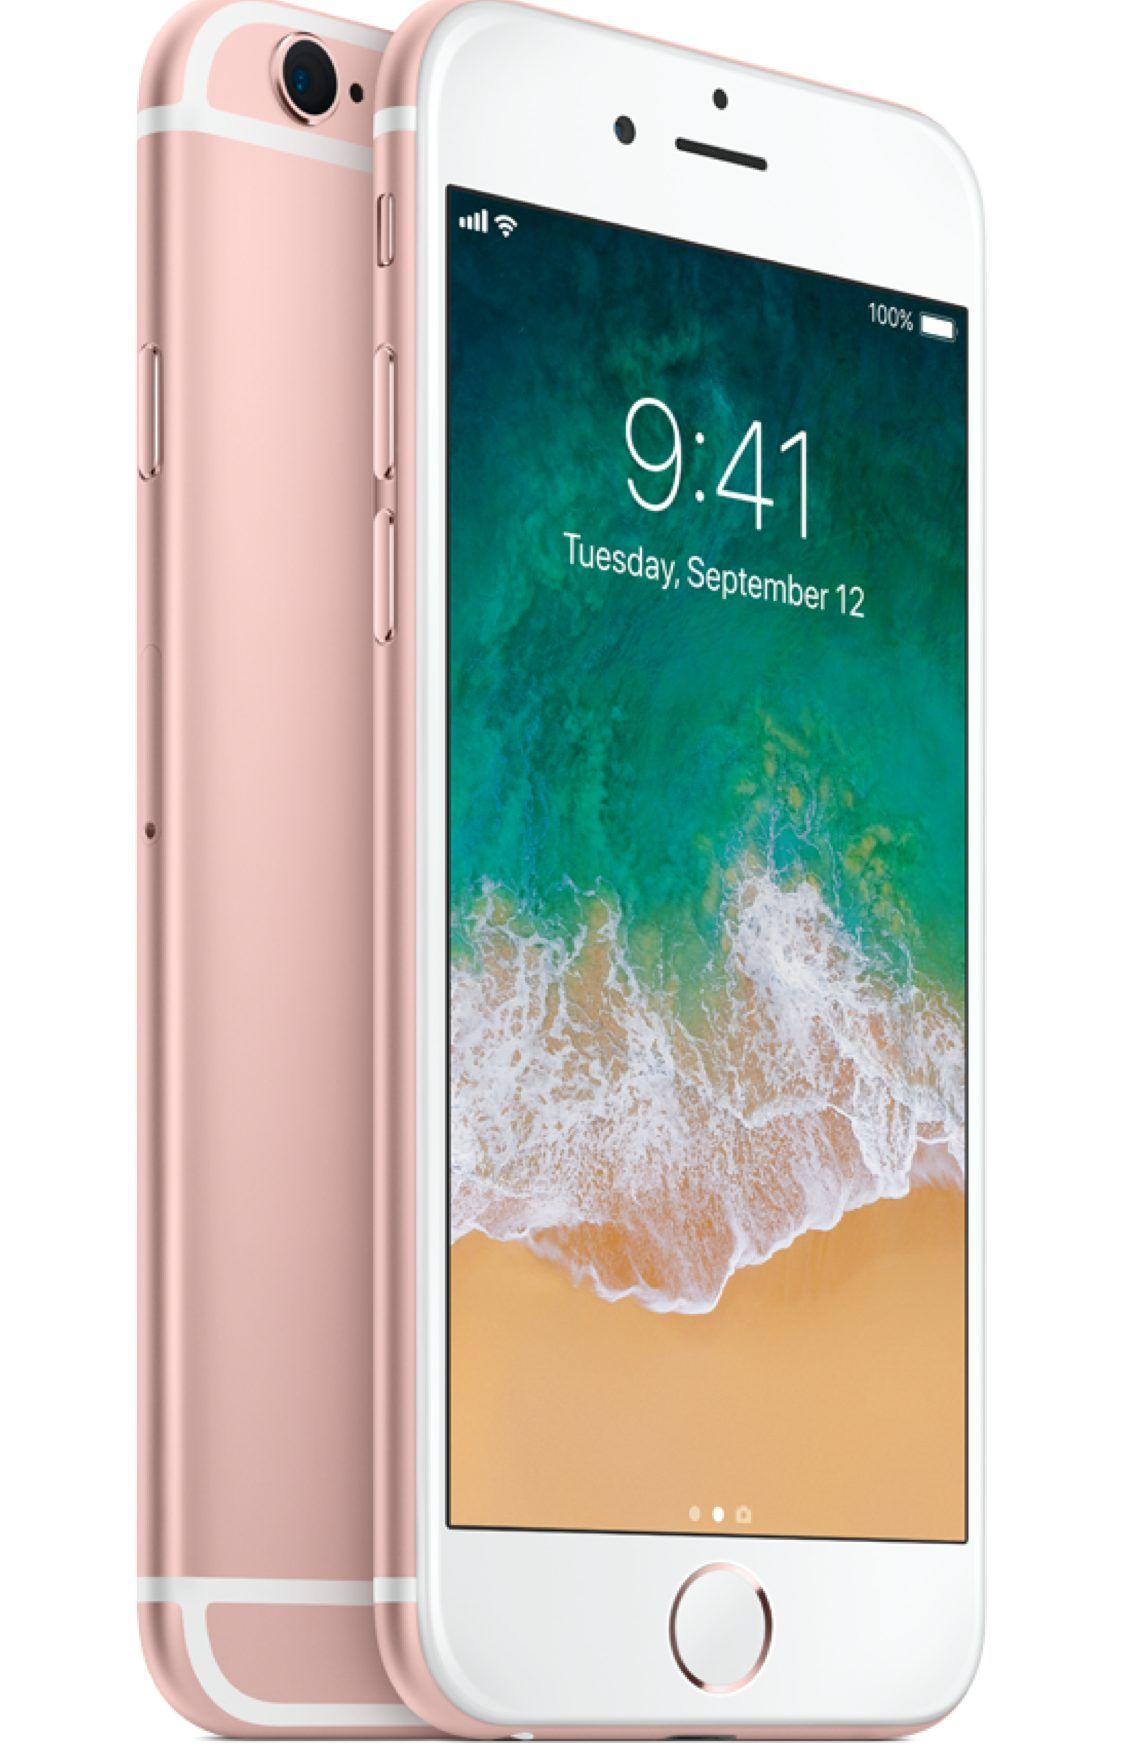 Apple iphone 6s 32gb rose gold main image 3